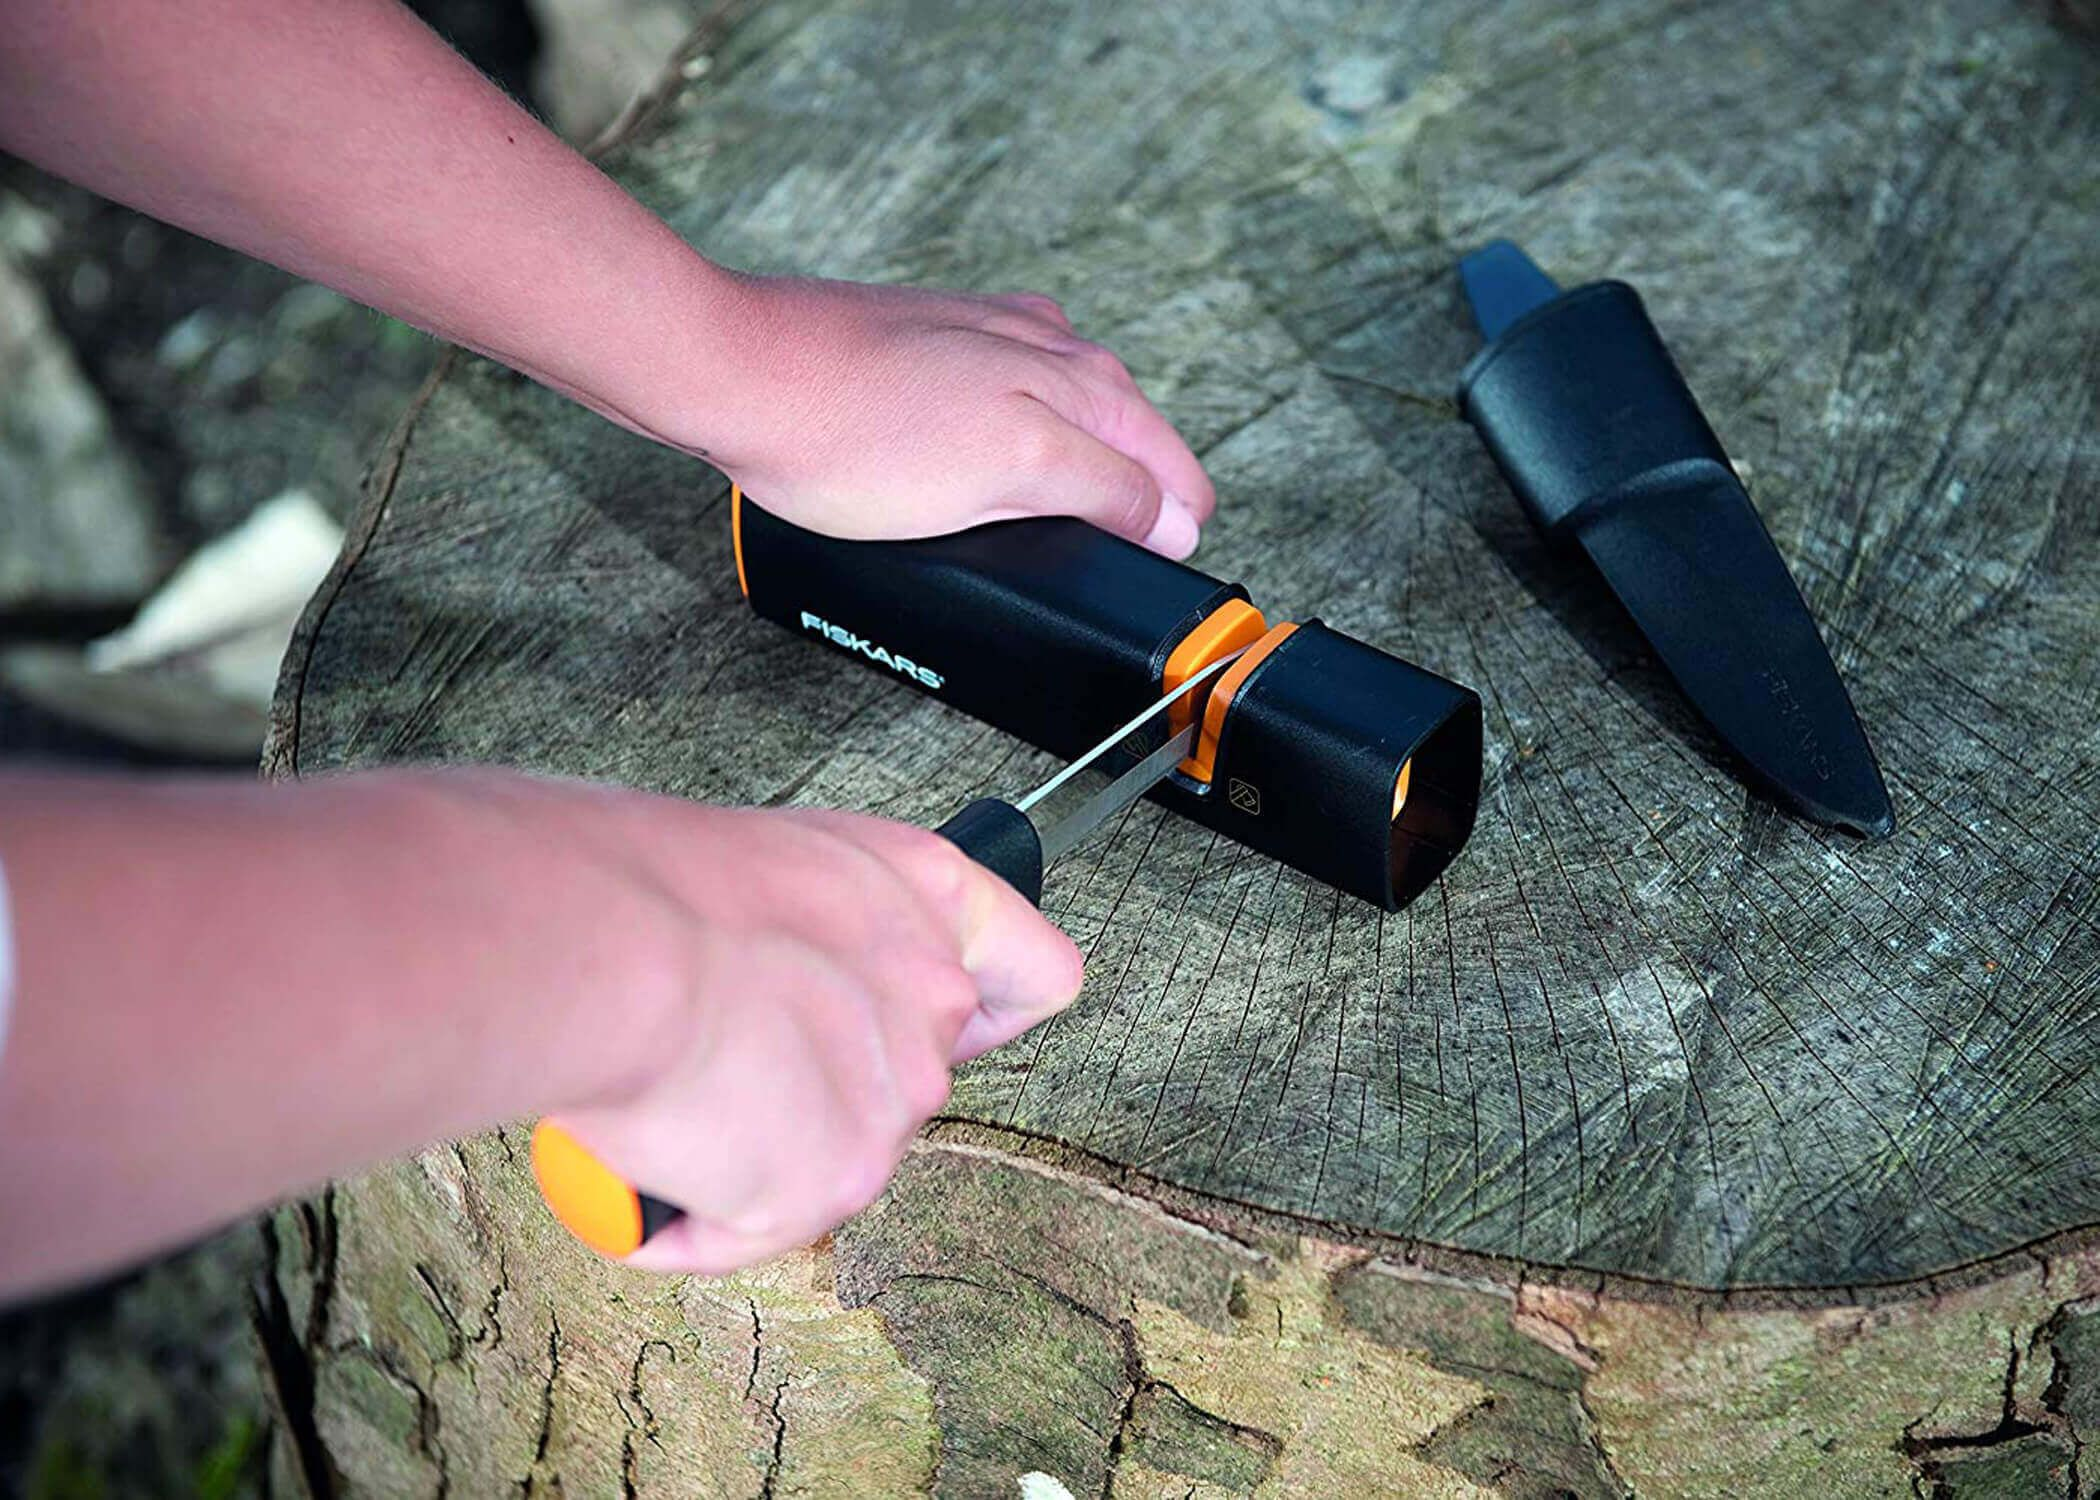 9 best axe sharpener 2020 learn how to sharpen an axe in